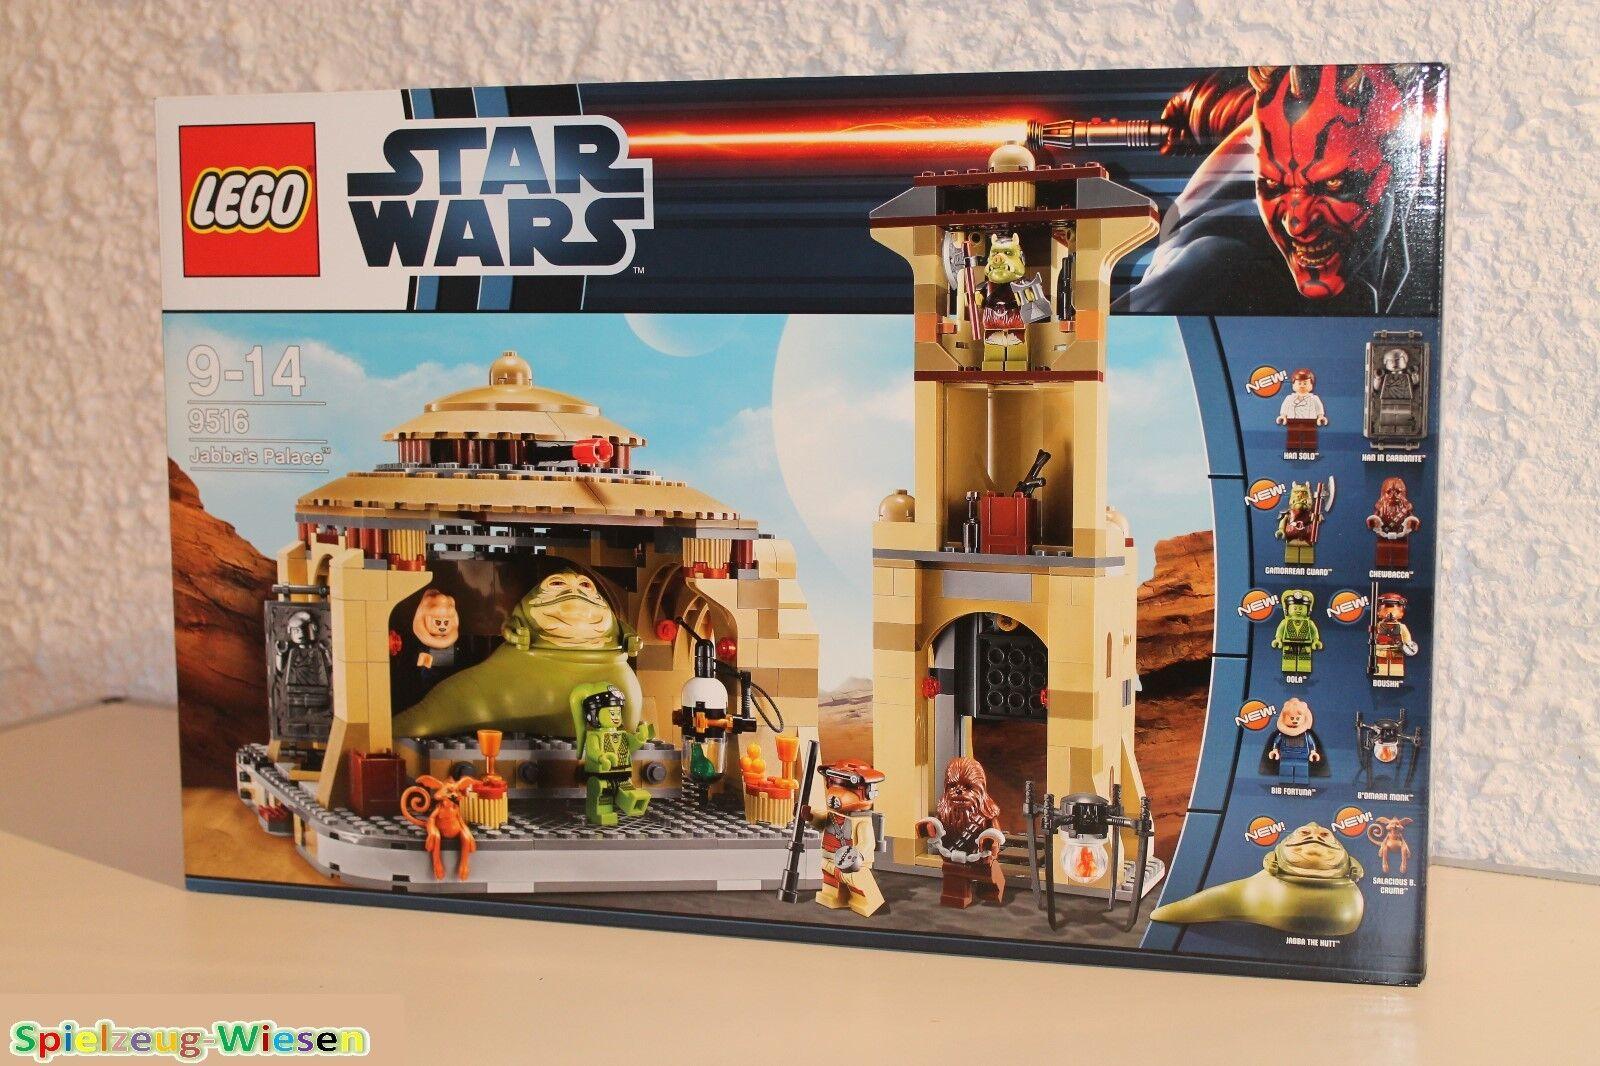 LEGO ® Star Wars ™ 9516 Jabba's Palace ™ - NOUVEAU & NEUF dans sa boîte -